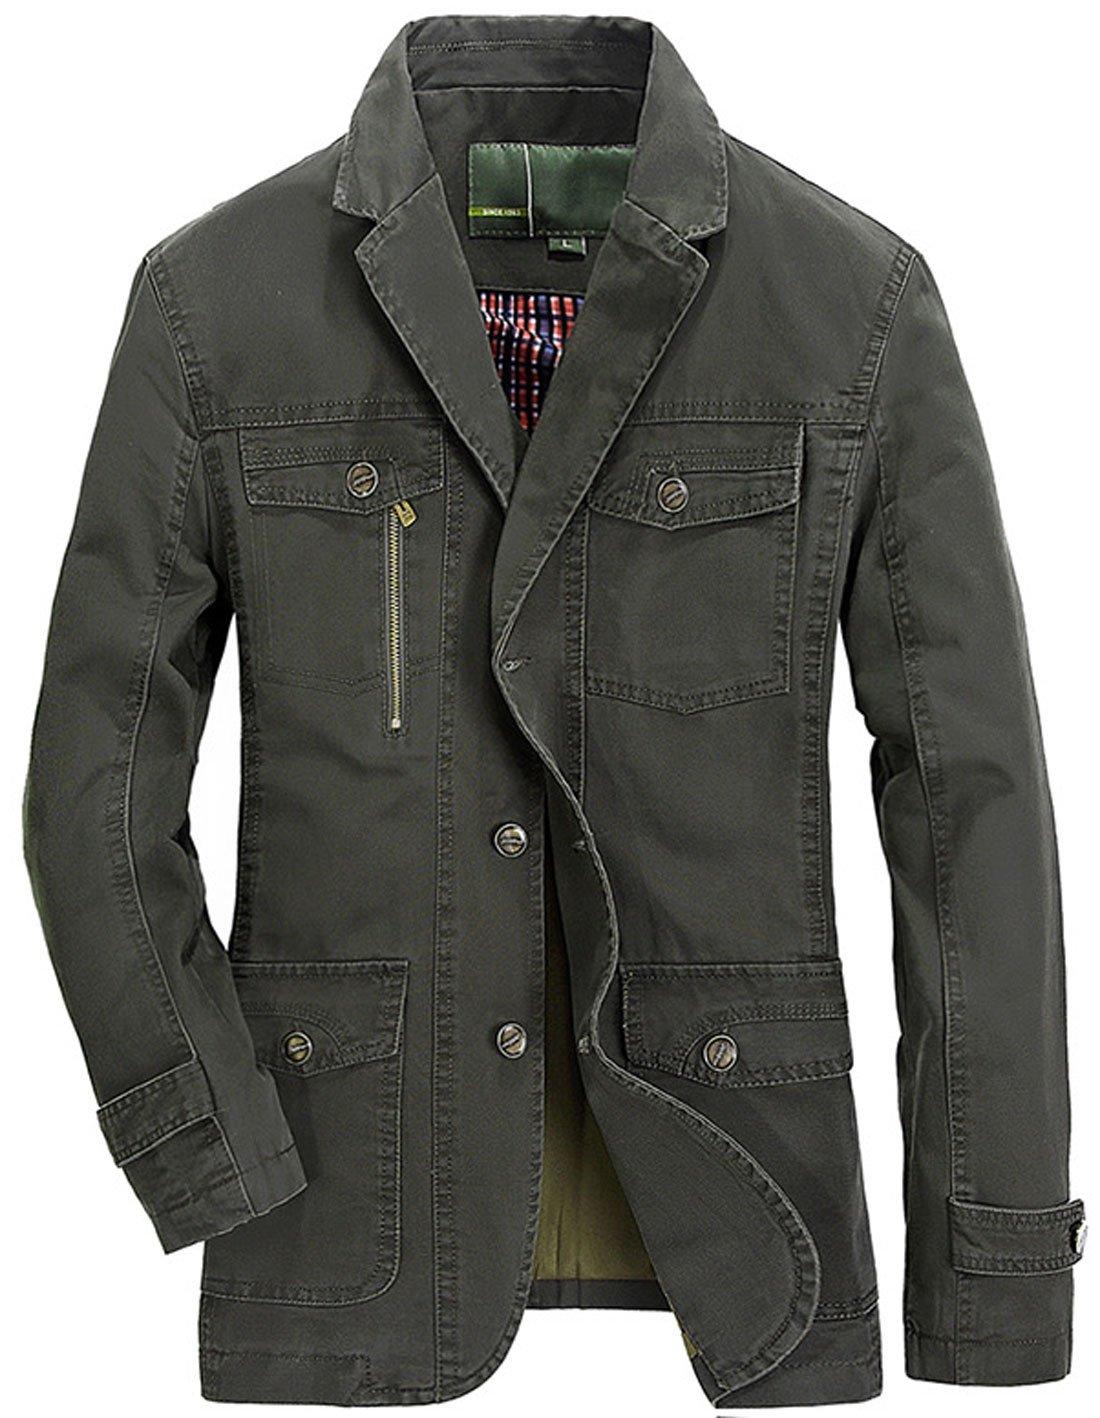 Chouyatou Men's Casual Notched Collar Multi Pockets 3 Buttons Lightweight Blazer Jackets (Large, Armygreen)